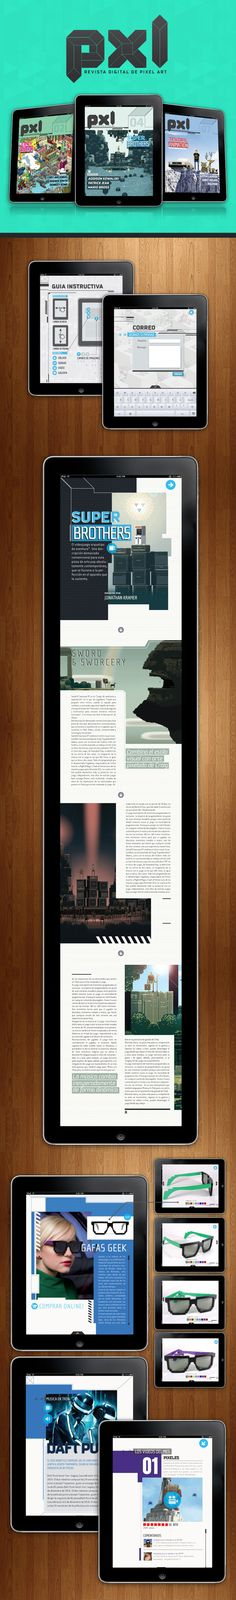 Digital Magazine - http://www.belenscoglio.com.ar/pxl-digitalmag.html #MagPlanet #TabletMagazine #DigitalMag